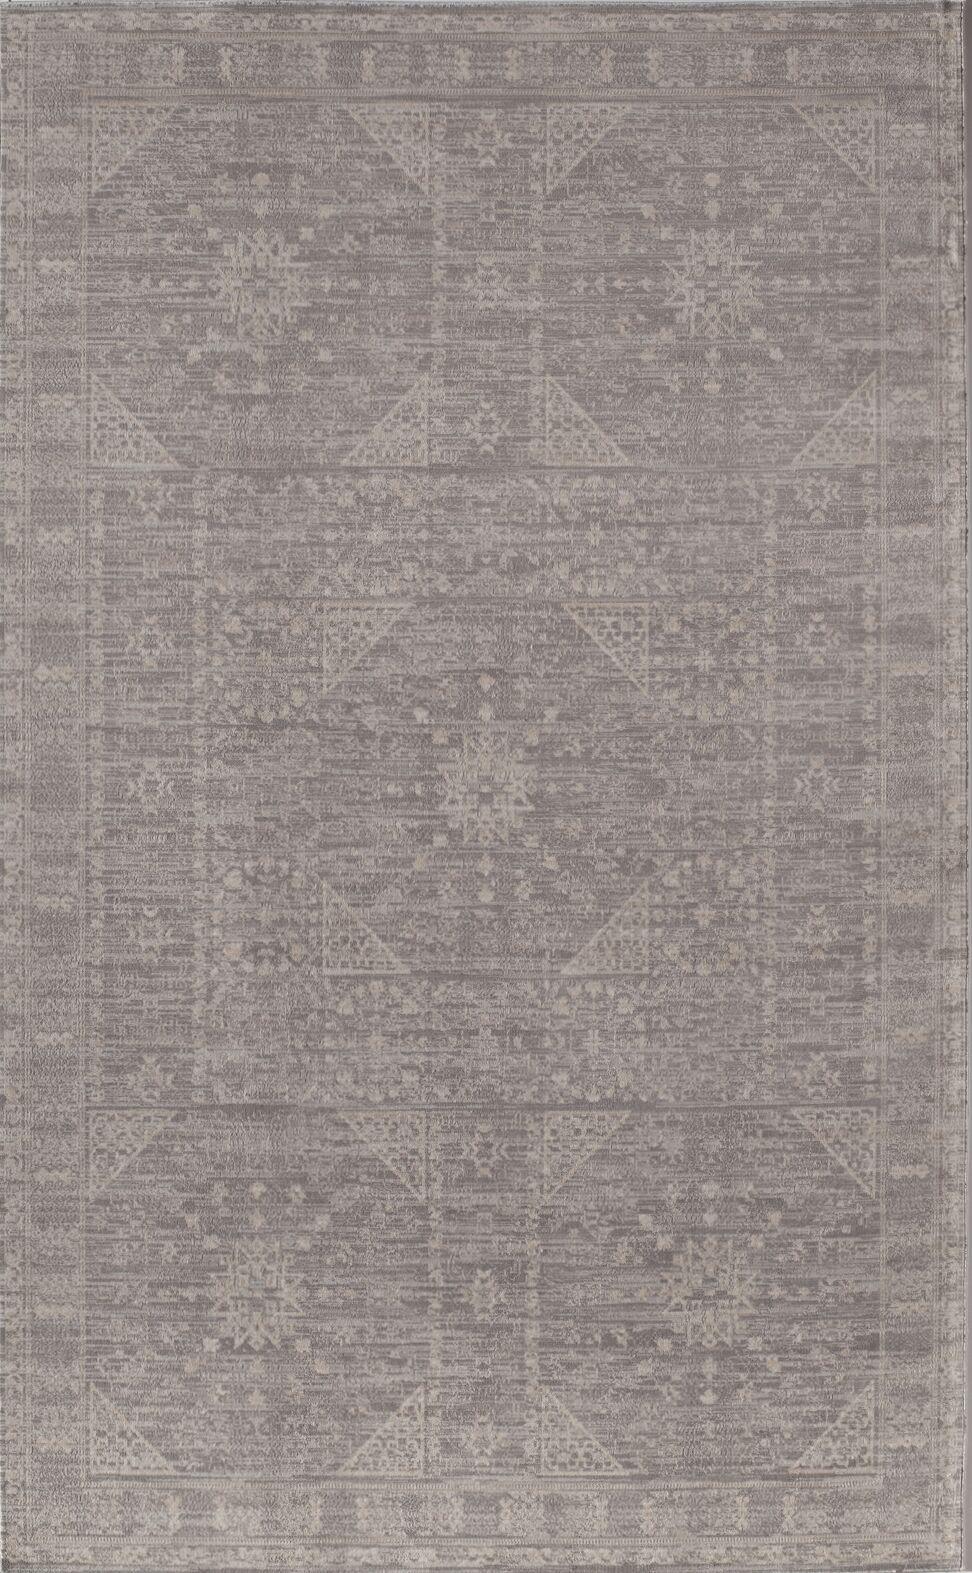 Wilshire Gray Area Rug Rug Size: Rectangle 8' x 10'